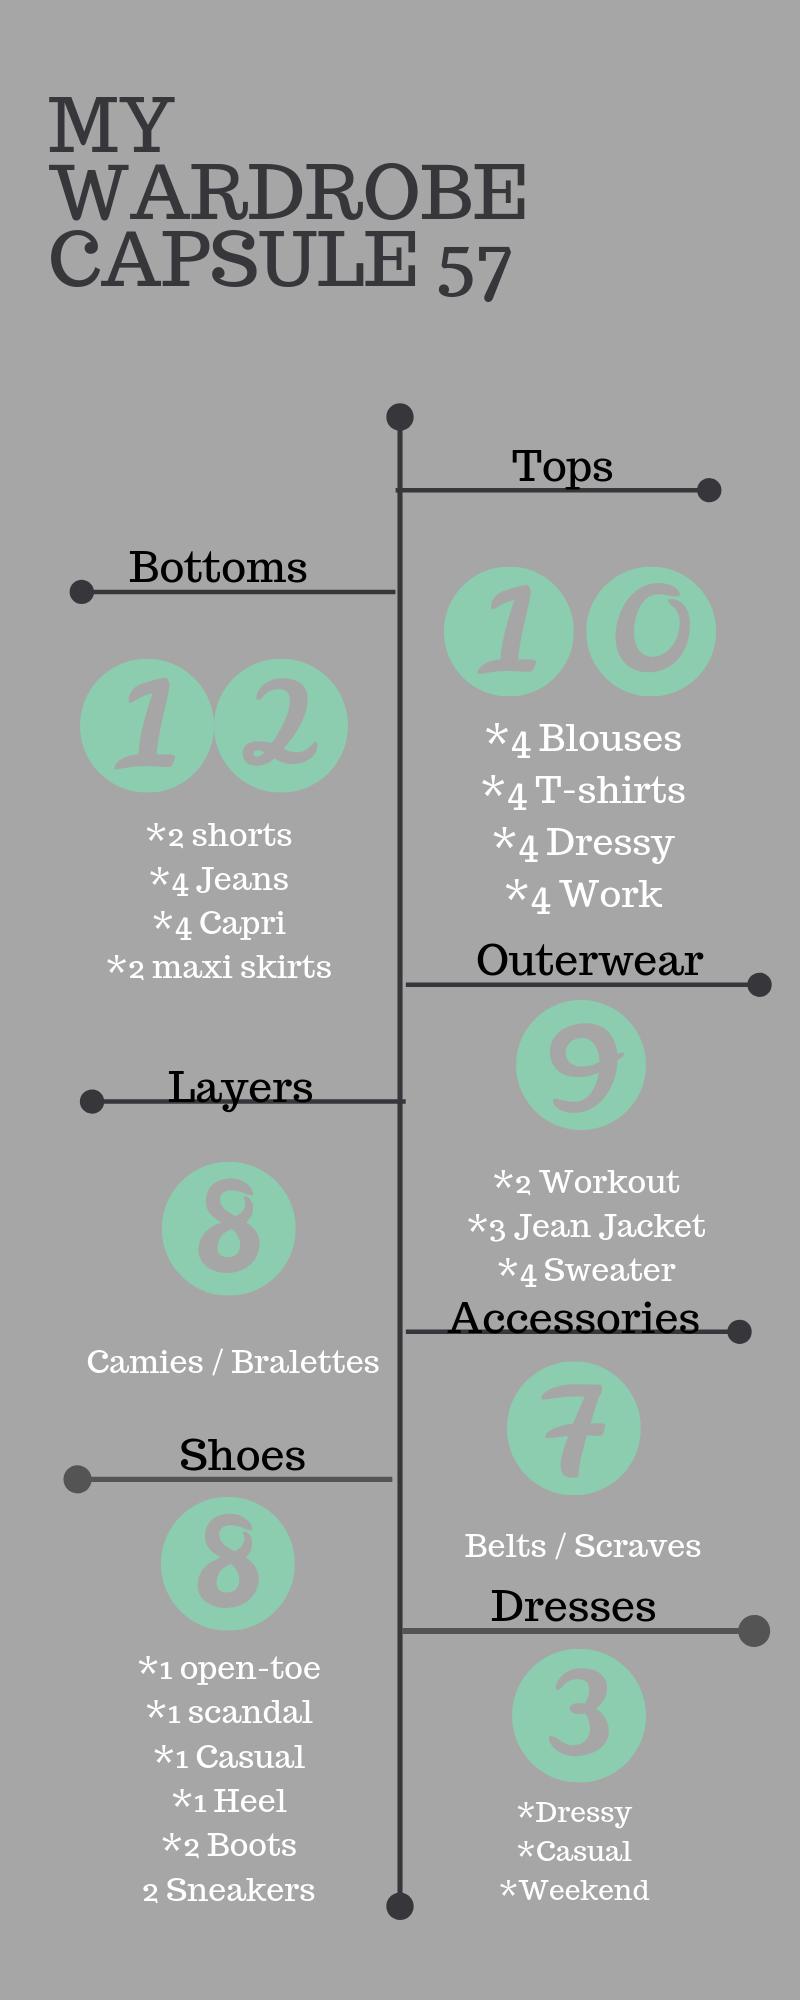 My Wardrobe Capsule 57 (1)